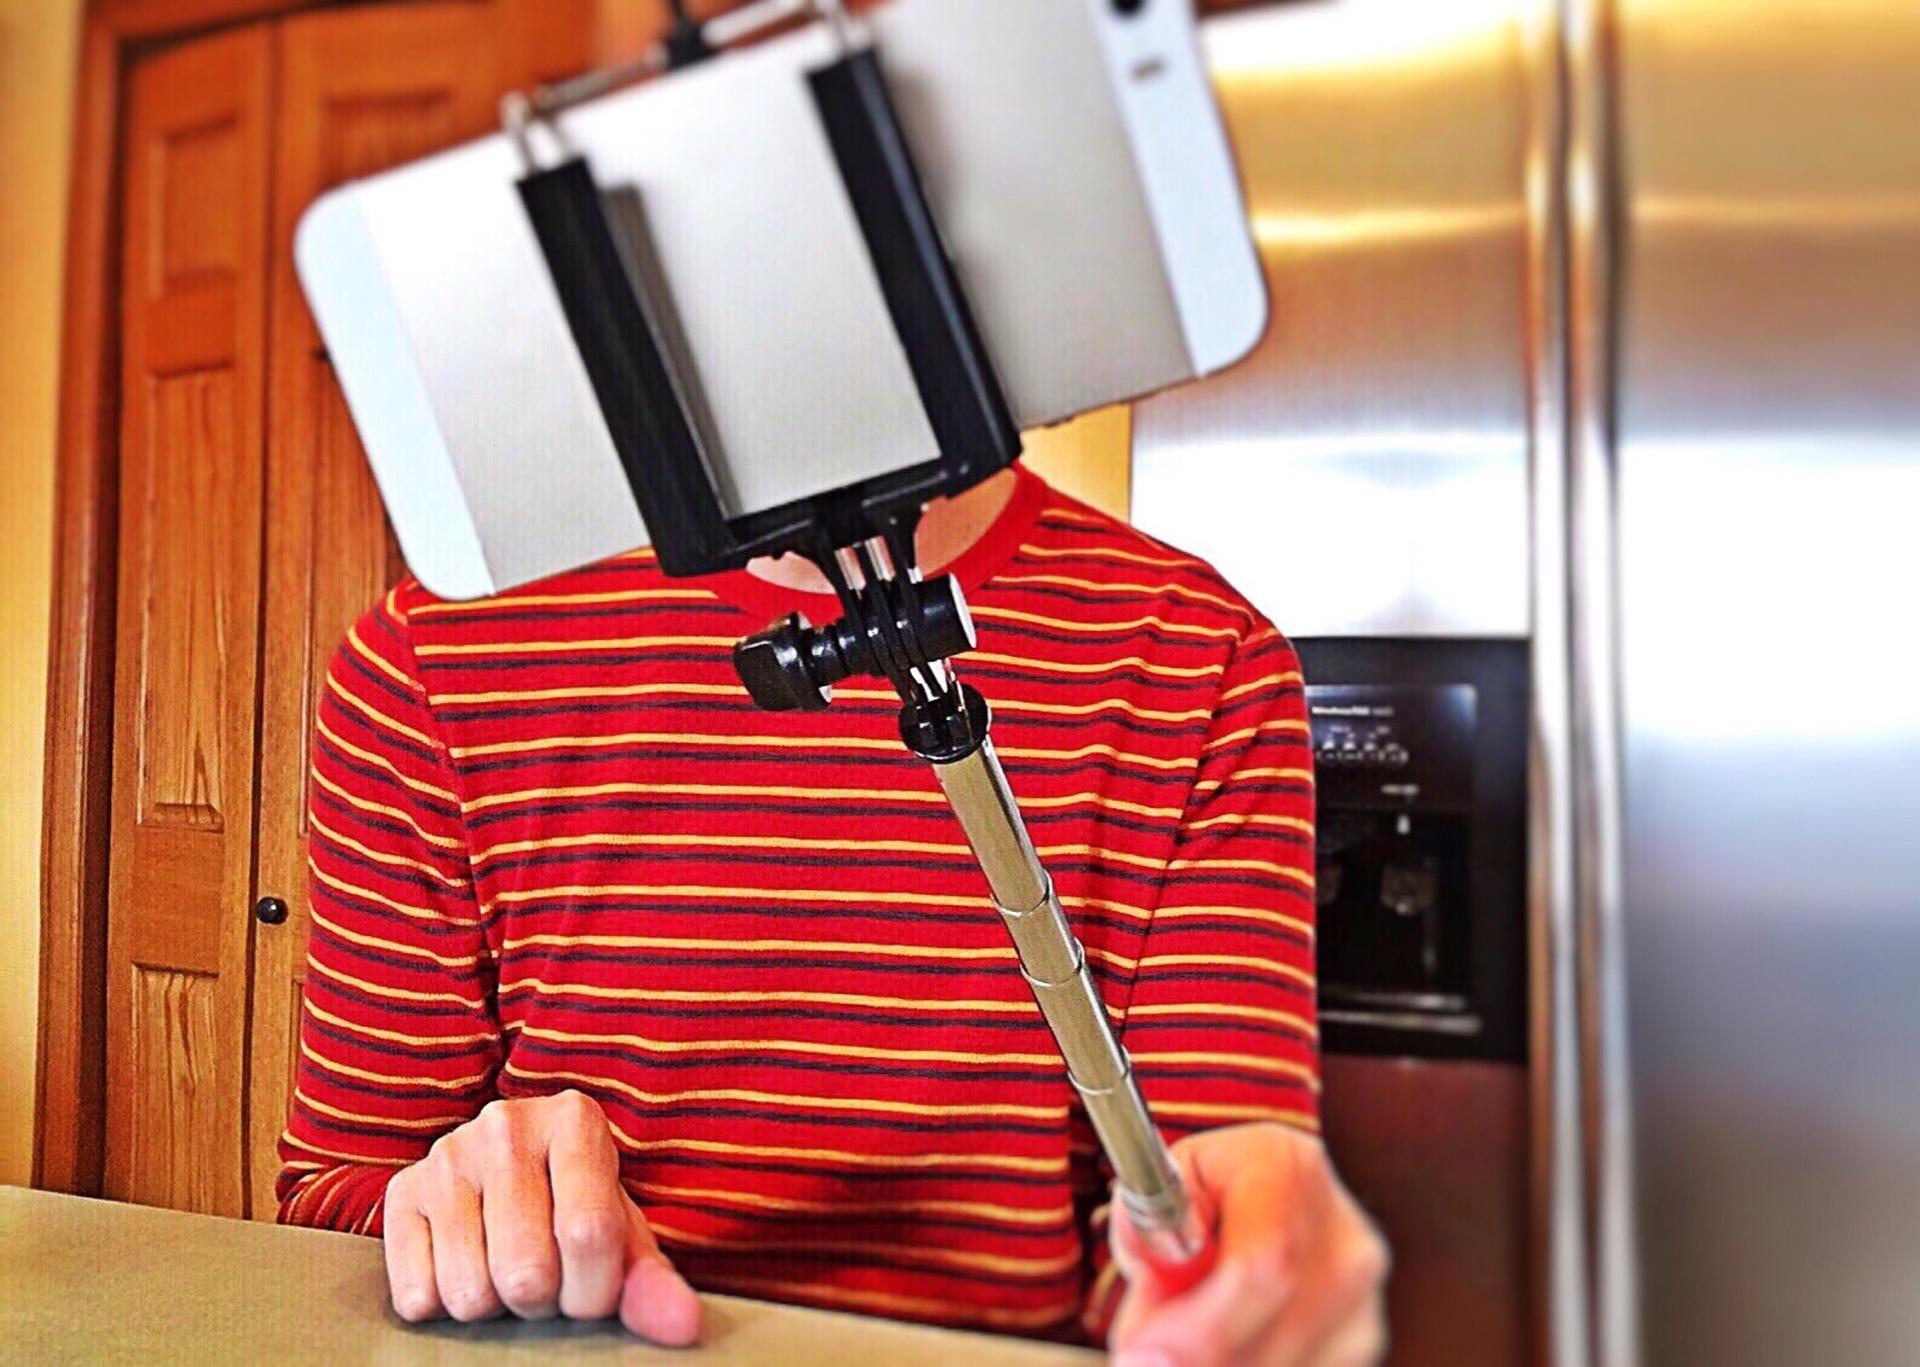 selfie 1323391 1920 14. Juni 2021